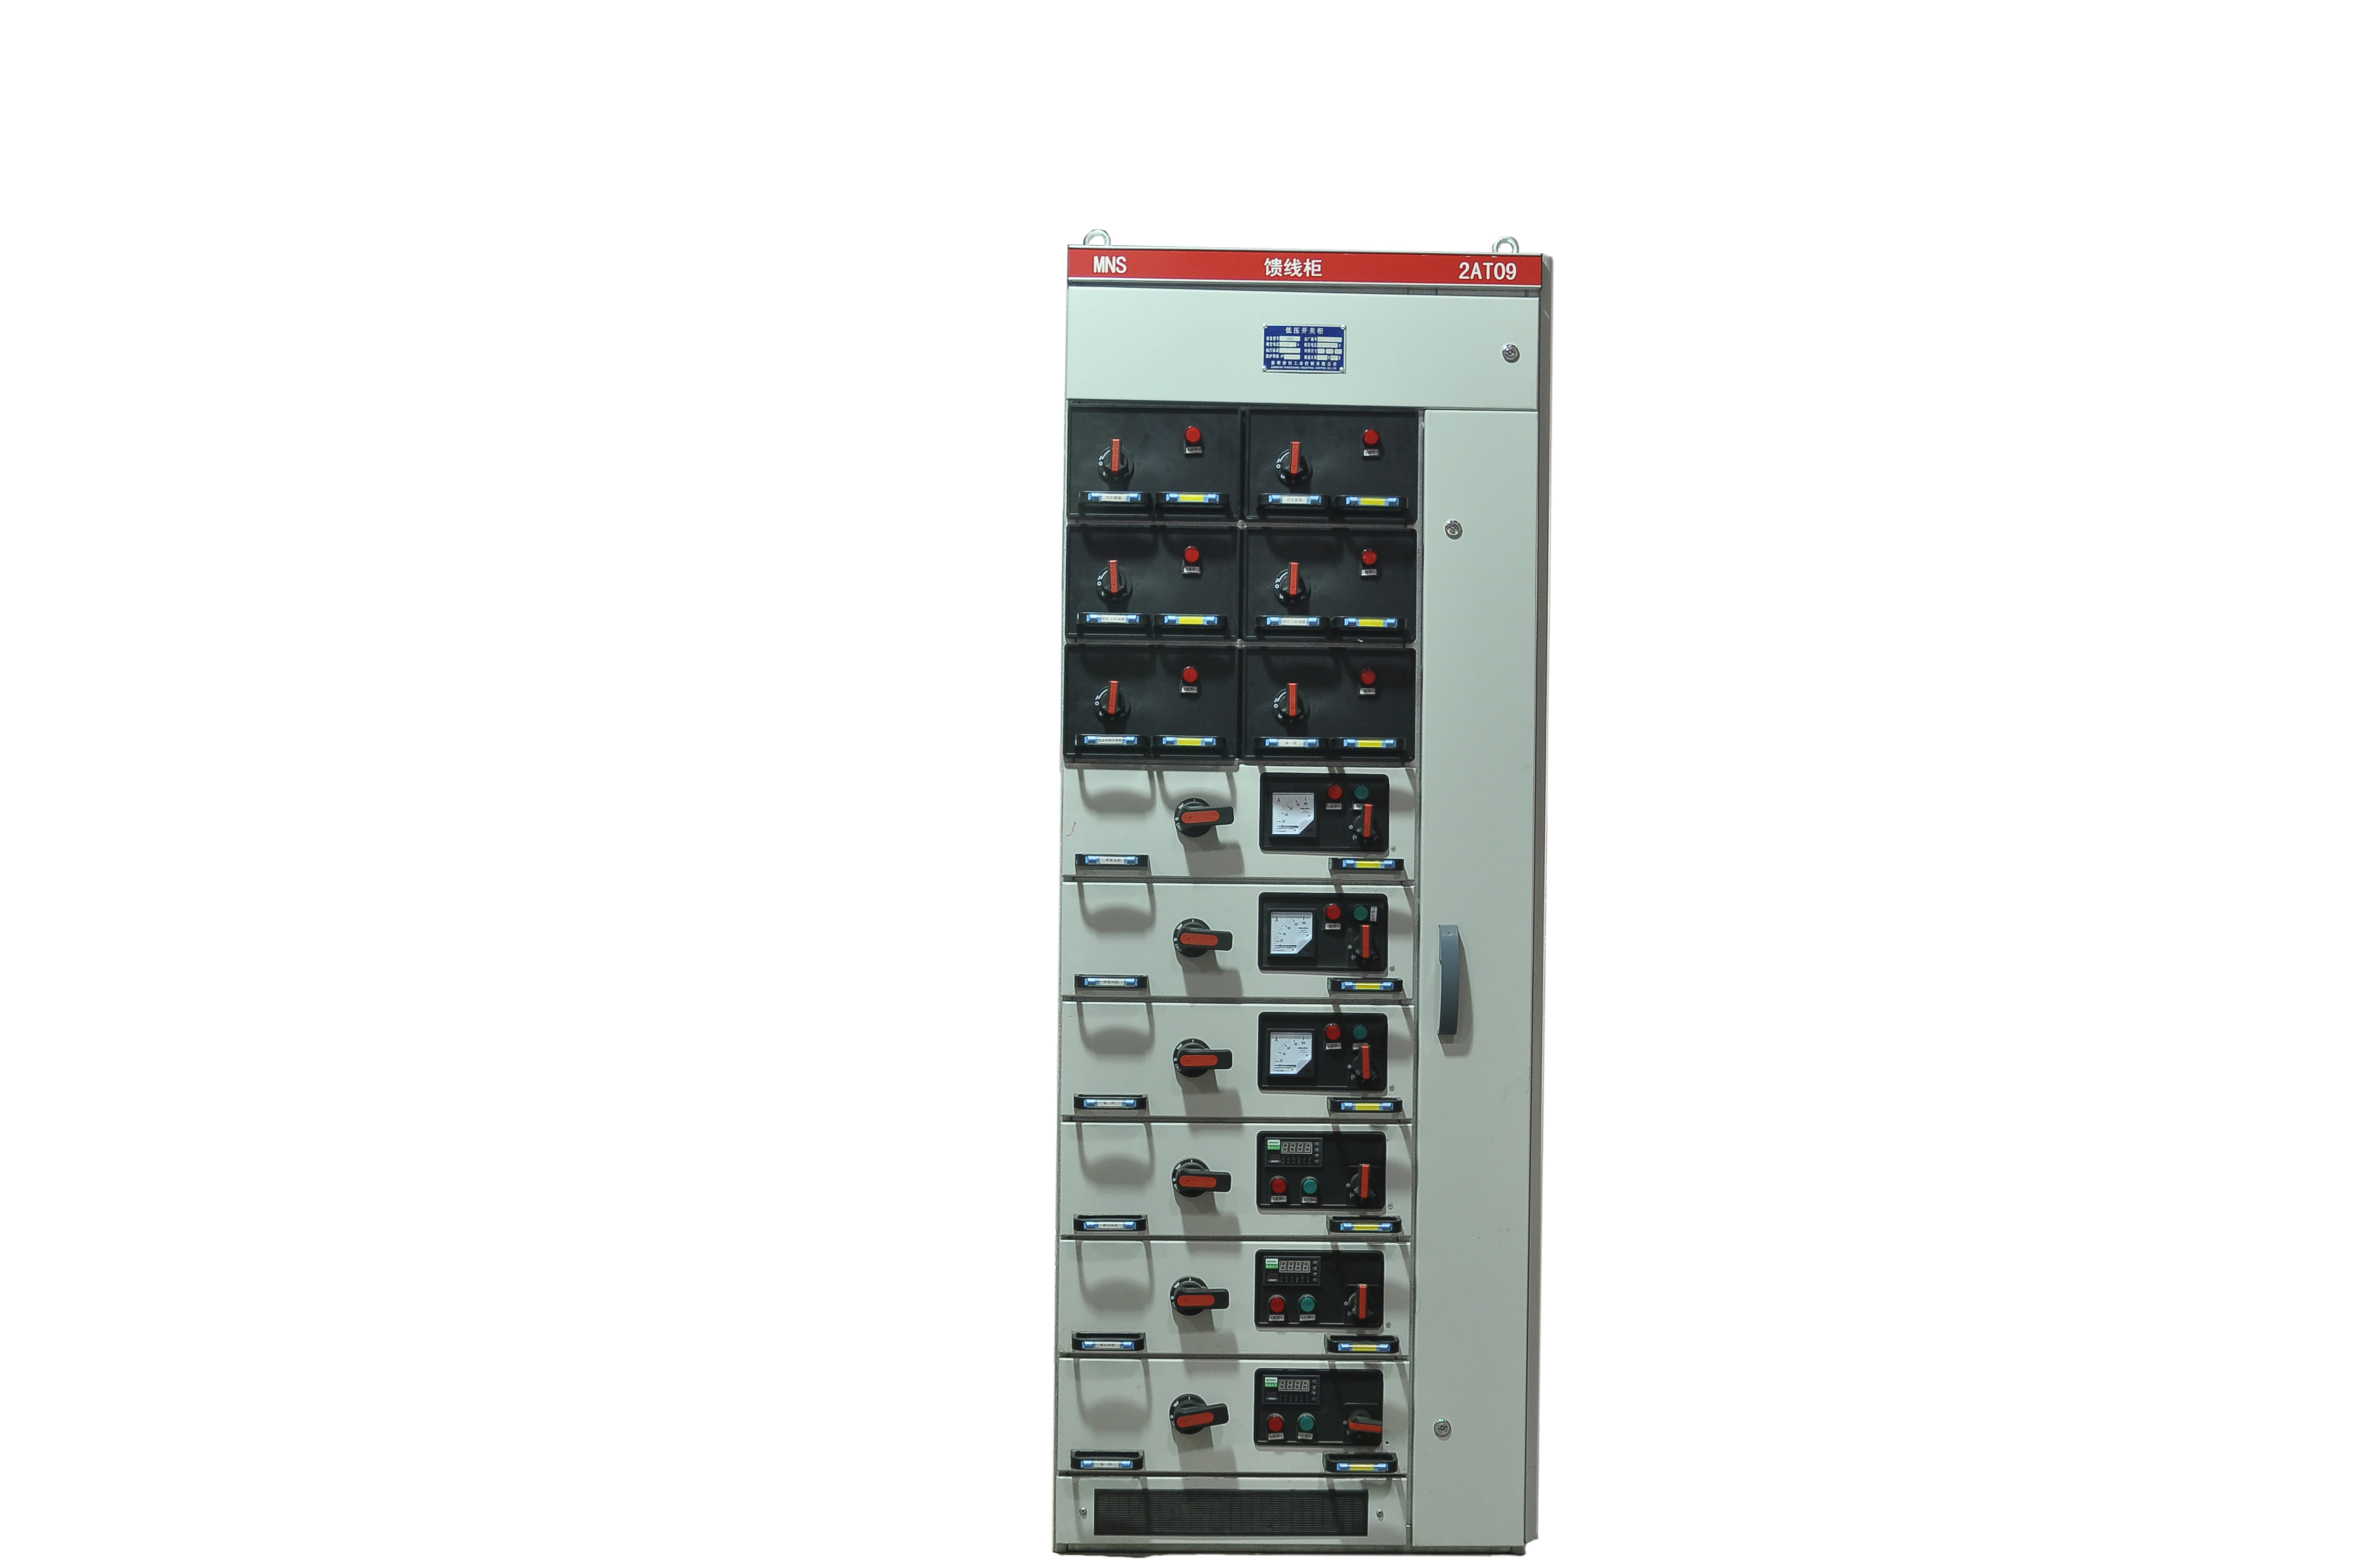 MNS低压抽出式开关柜概述www.shuizugui.net 装置适用于发电厂,变电所,石油化工企业,厂矿企业,高屋建筑等低压配电系统的动力配电和电动机控制中心,电容补偿的电能转换分配与控制。在大单机容量的发电机,大规模石化等行业,低压动力控制中心和电动机控制中心等电力使用场合时能满足与计算机接口的特殊需要。 正常使用条件www.